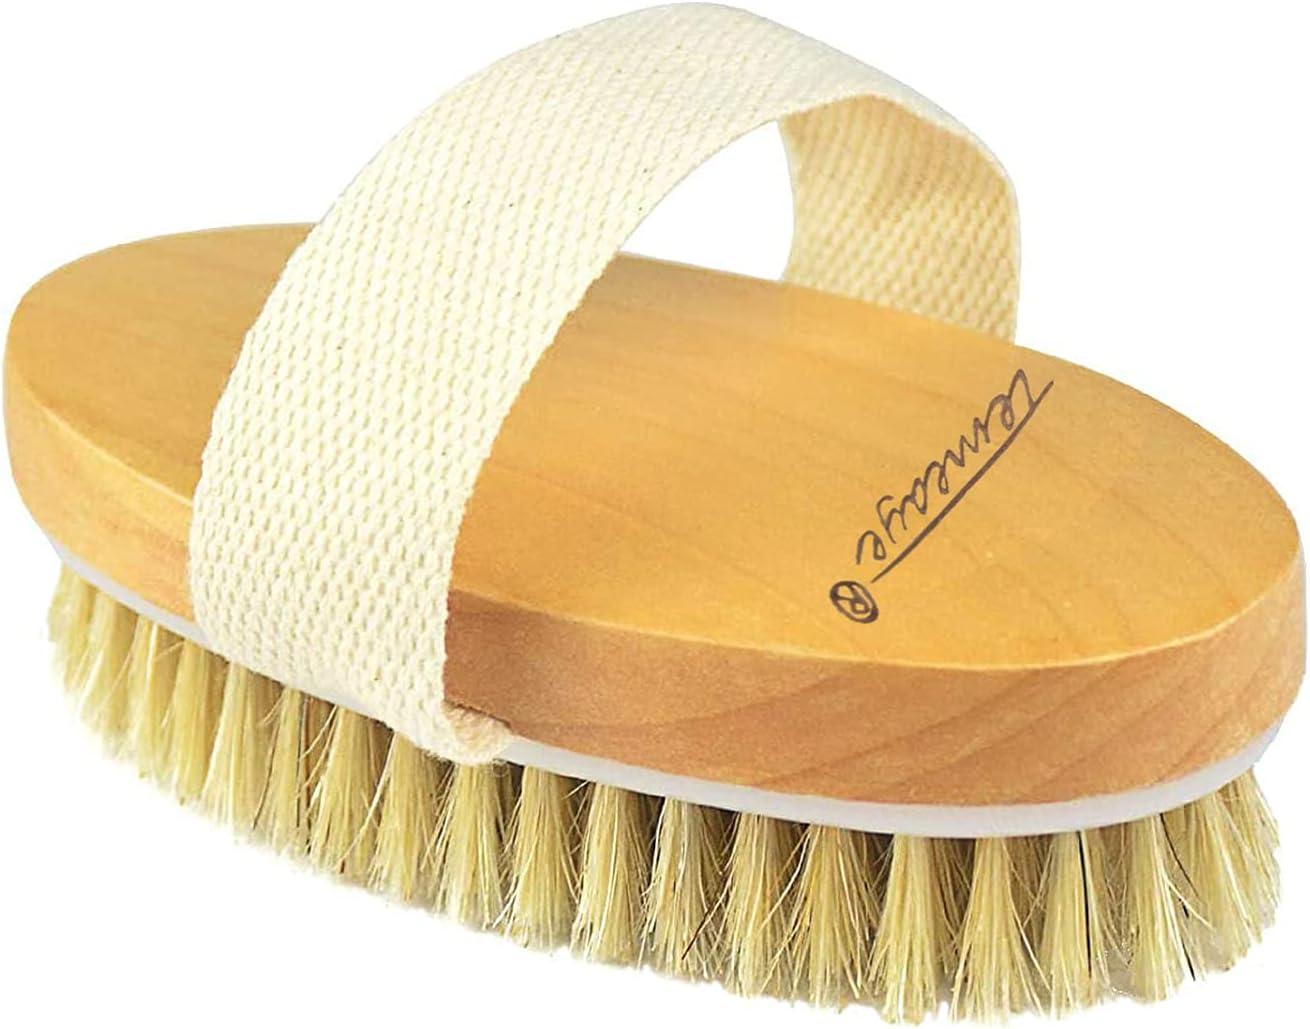 Dry Brush Very popular Body High quality new Natural Exfoliating Skin Bristle